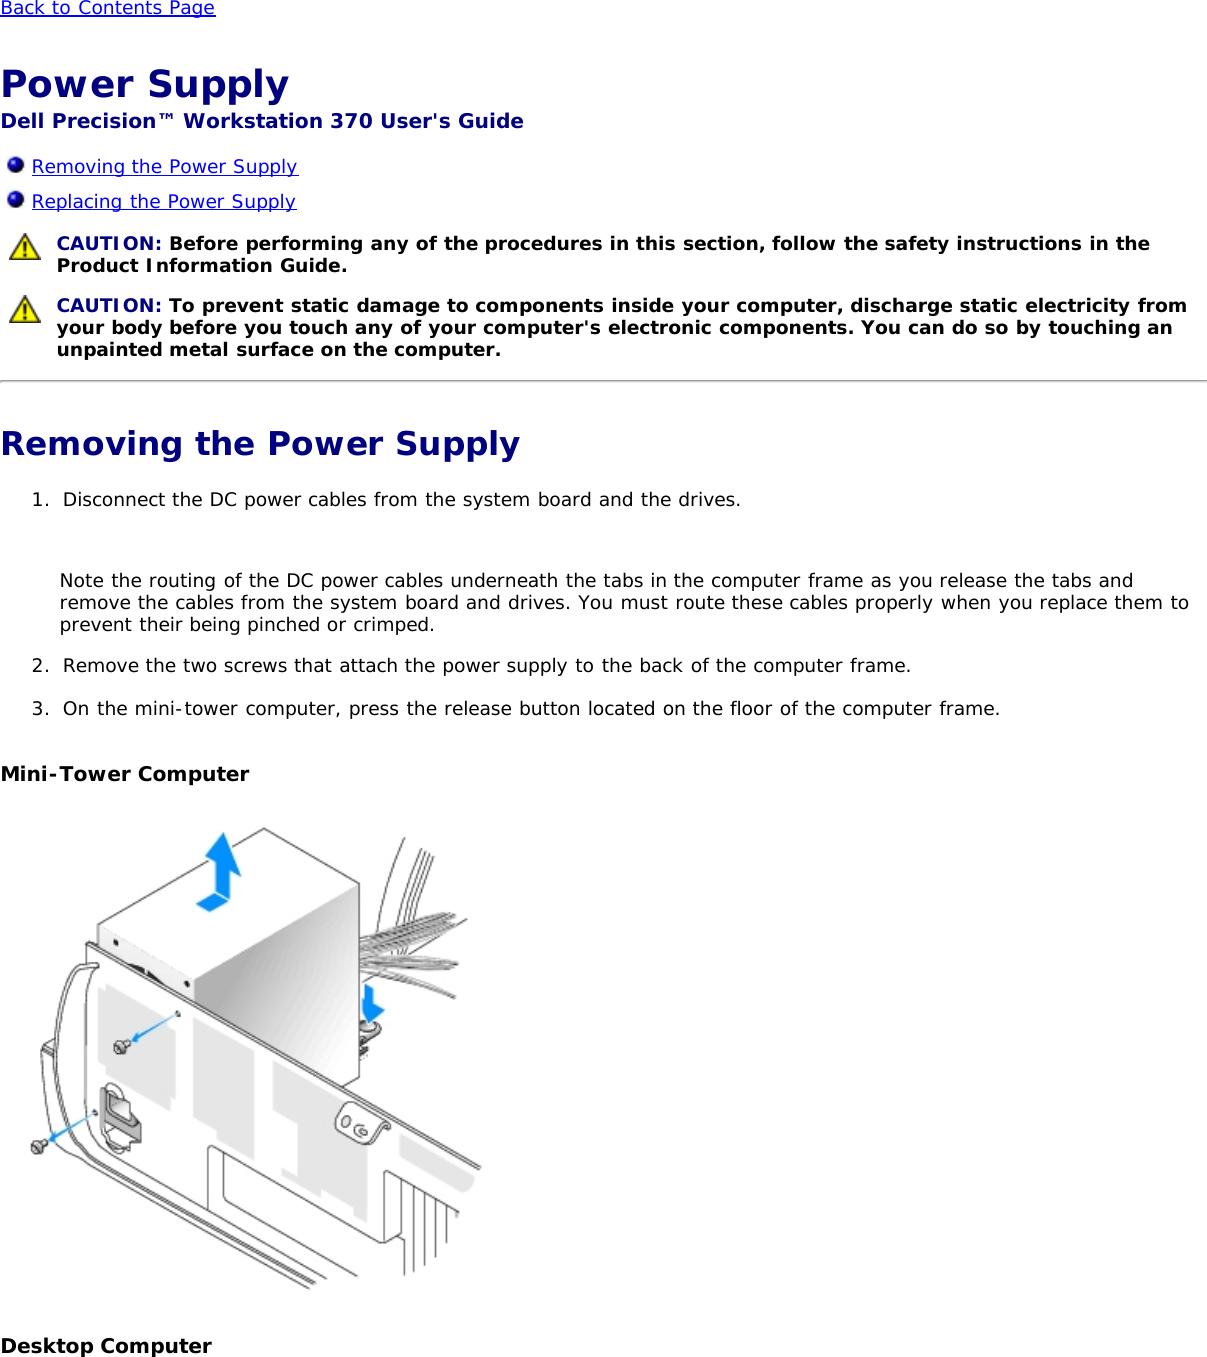 Dell Precision 370 Users Manual Workstation User's Guide